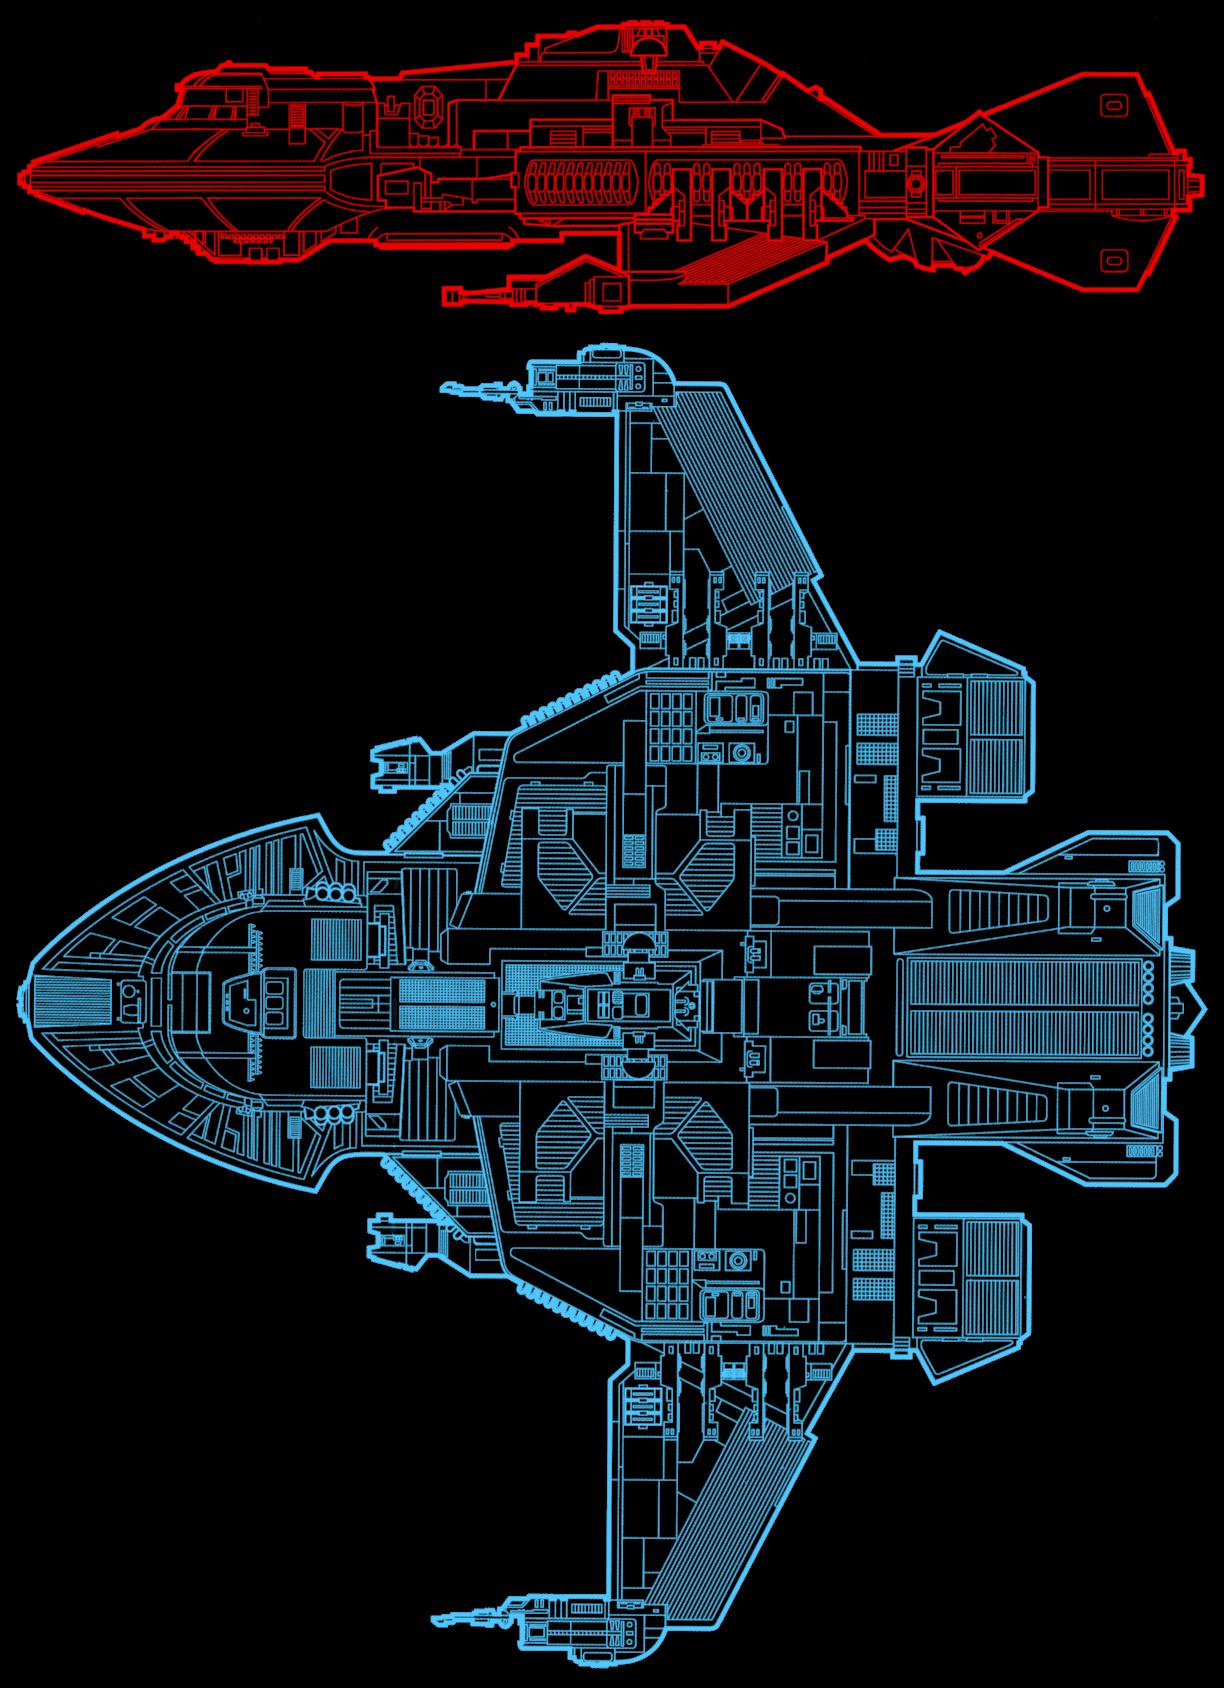 Ex Astris Scientia Voyager Inconsistencies Star Trek Engineering Schematics Fact Files